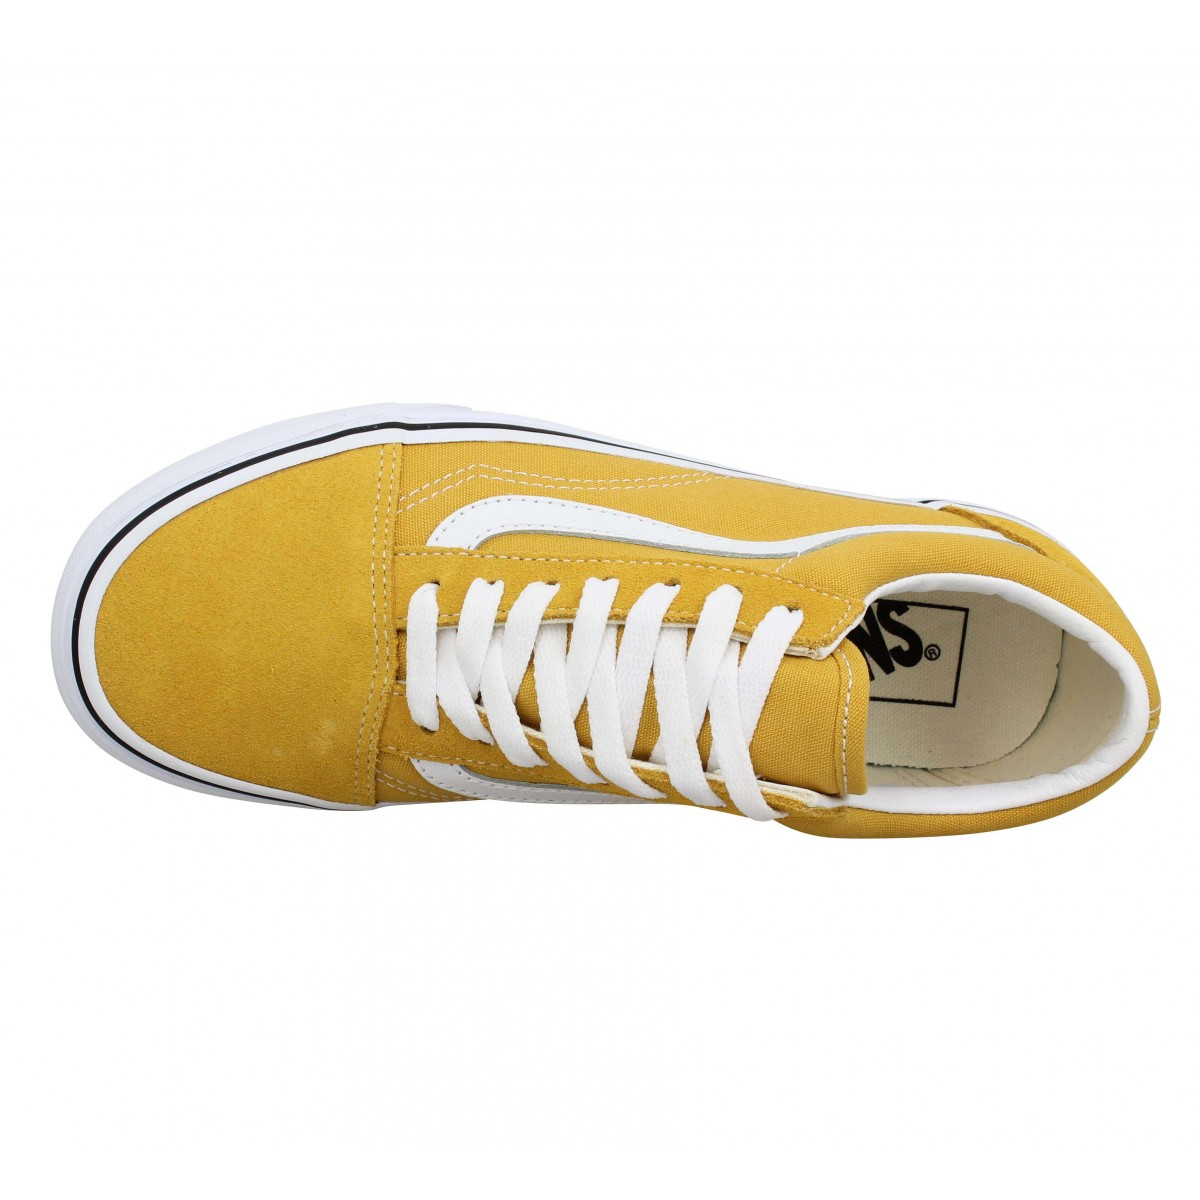 Vans old skool velours toile jaune femme homme | Fanny